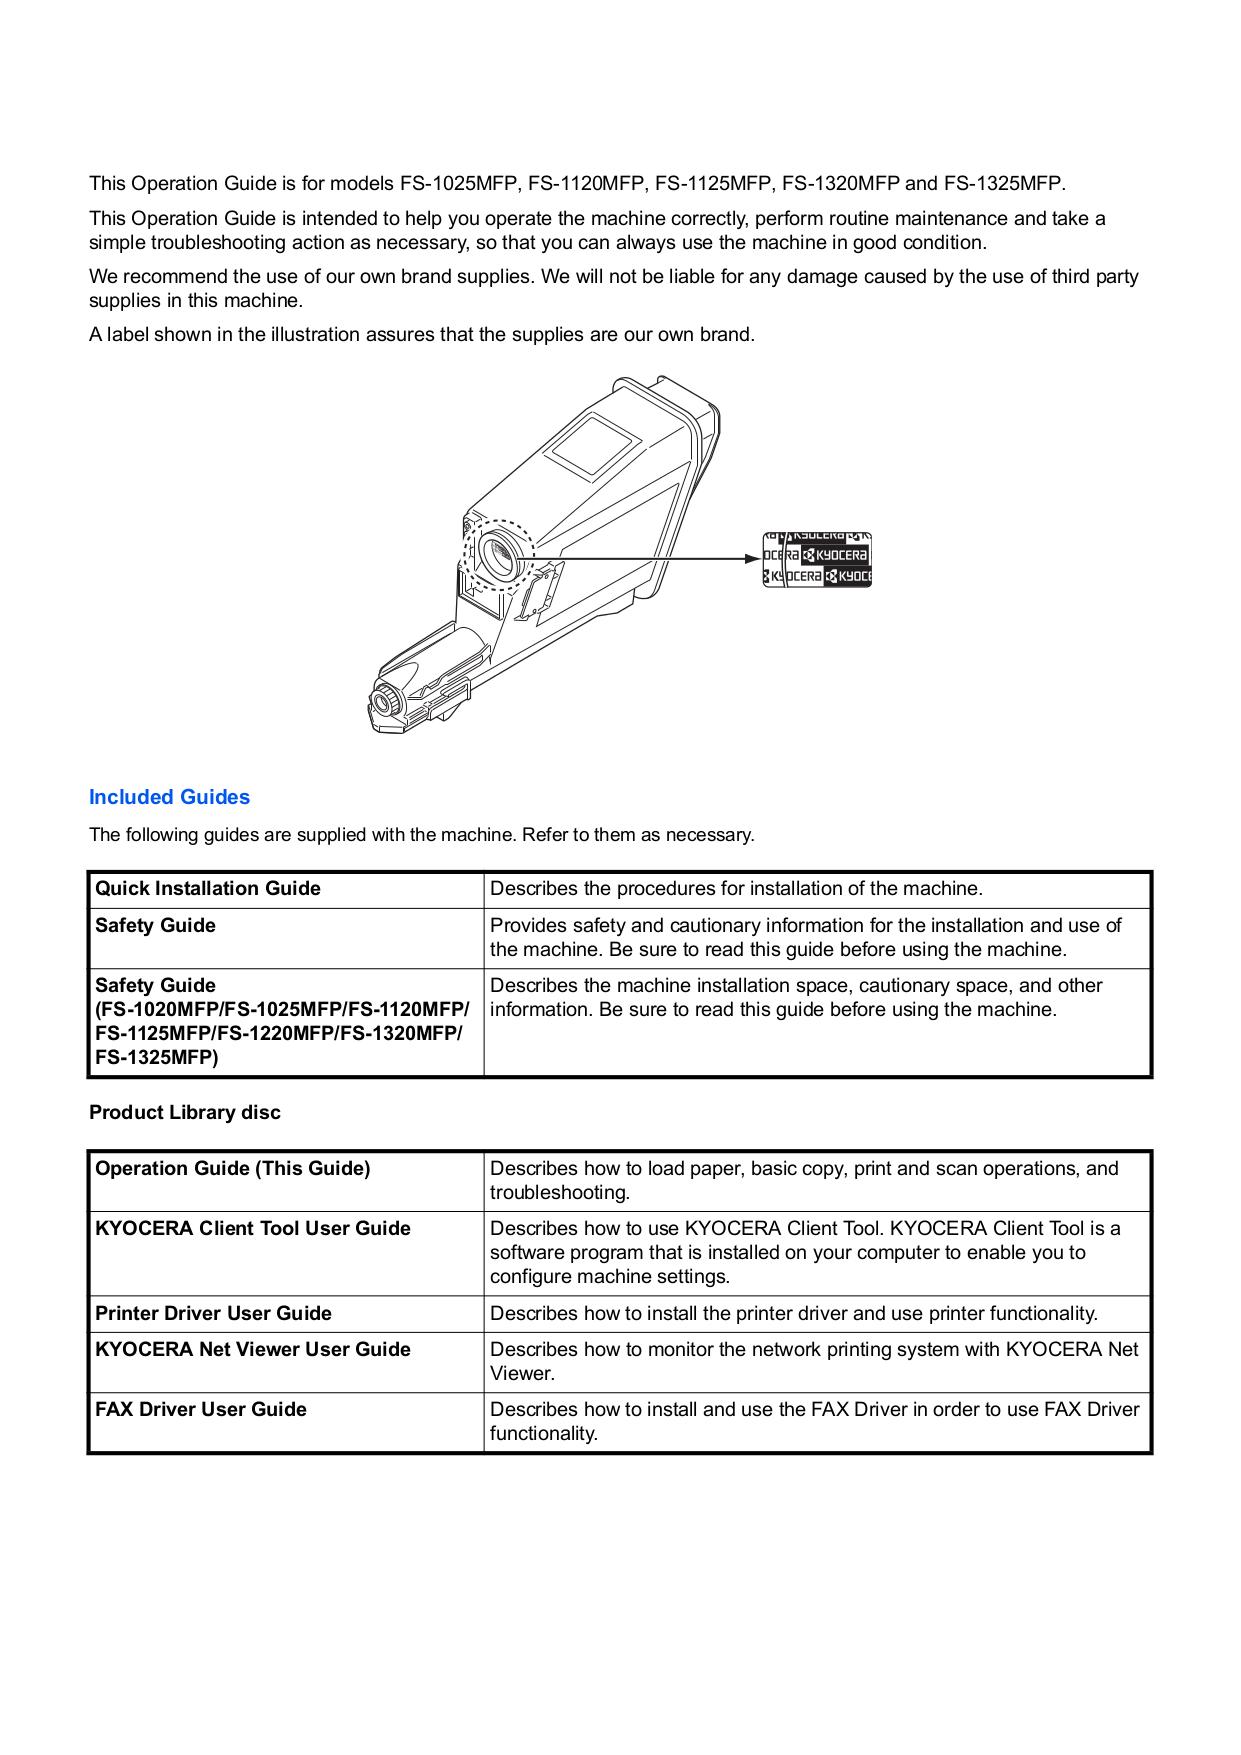 kyocera netviewer manual